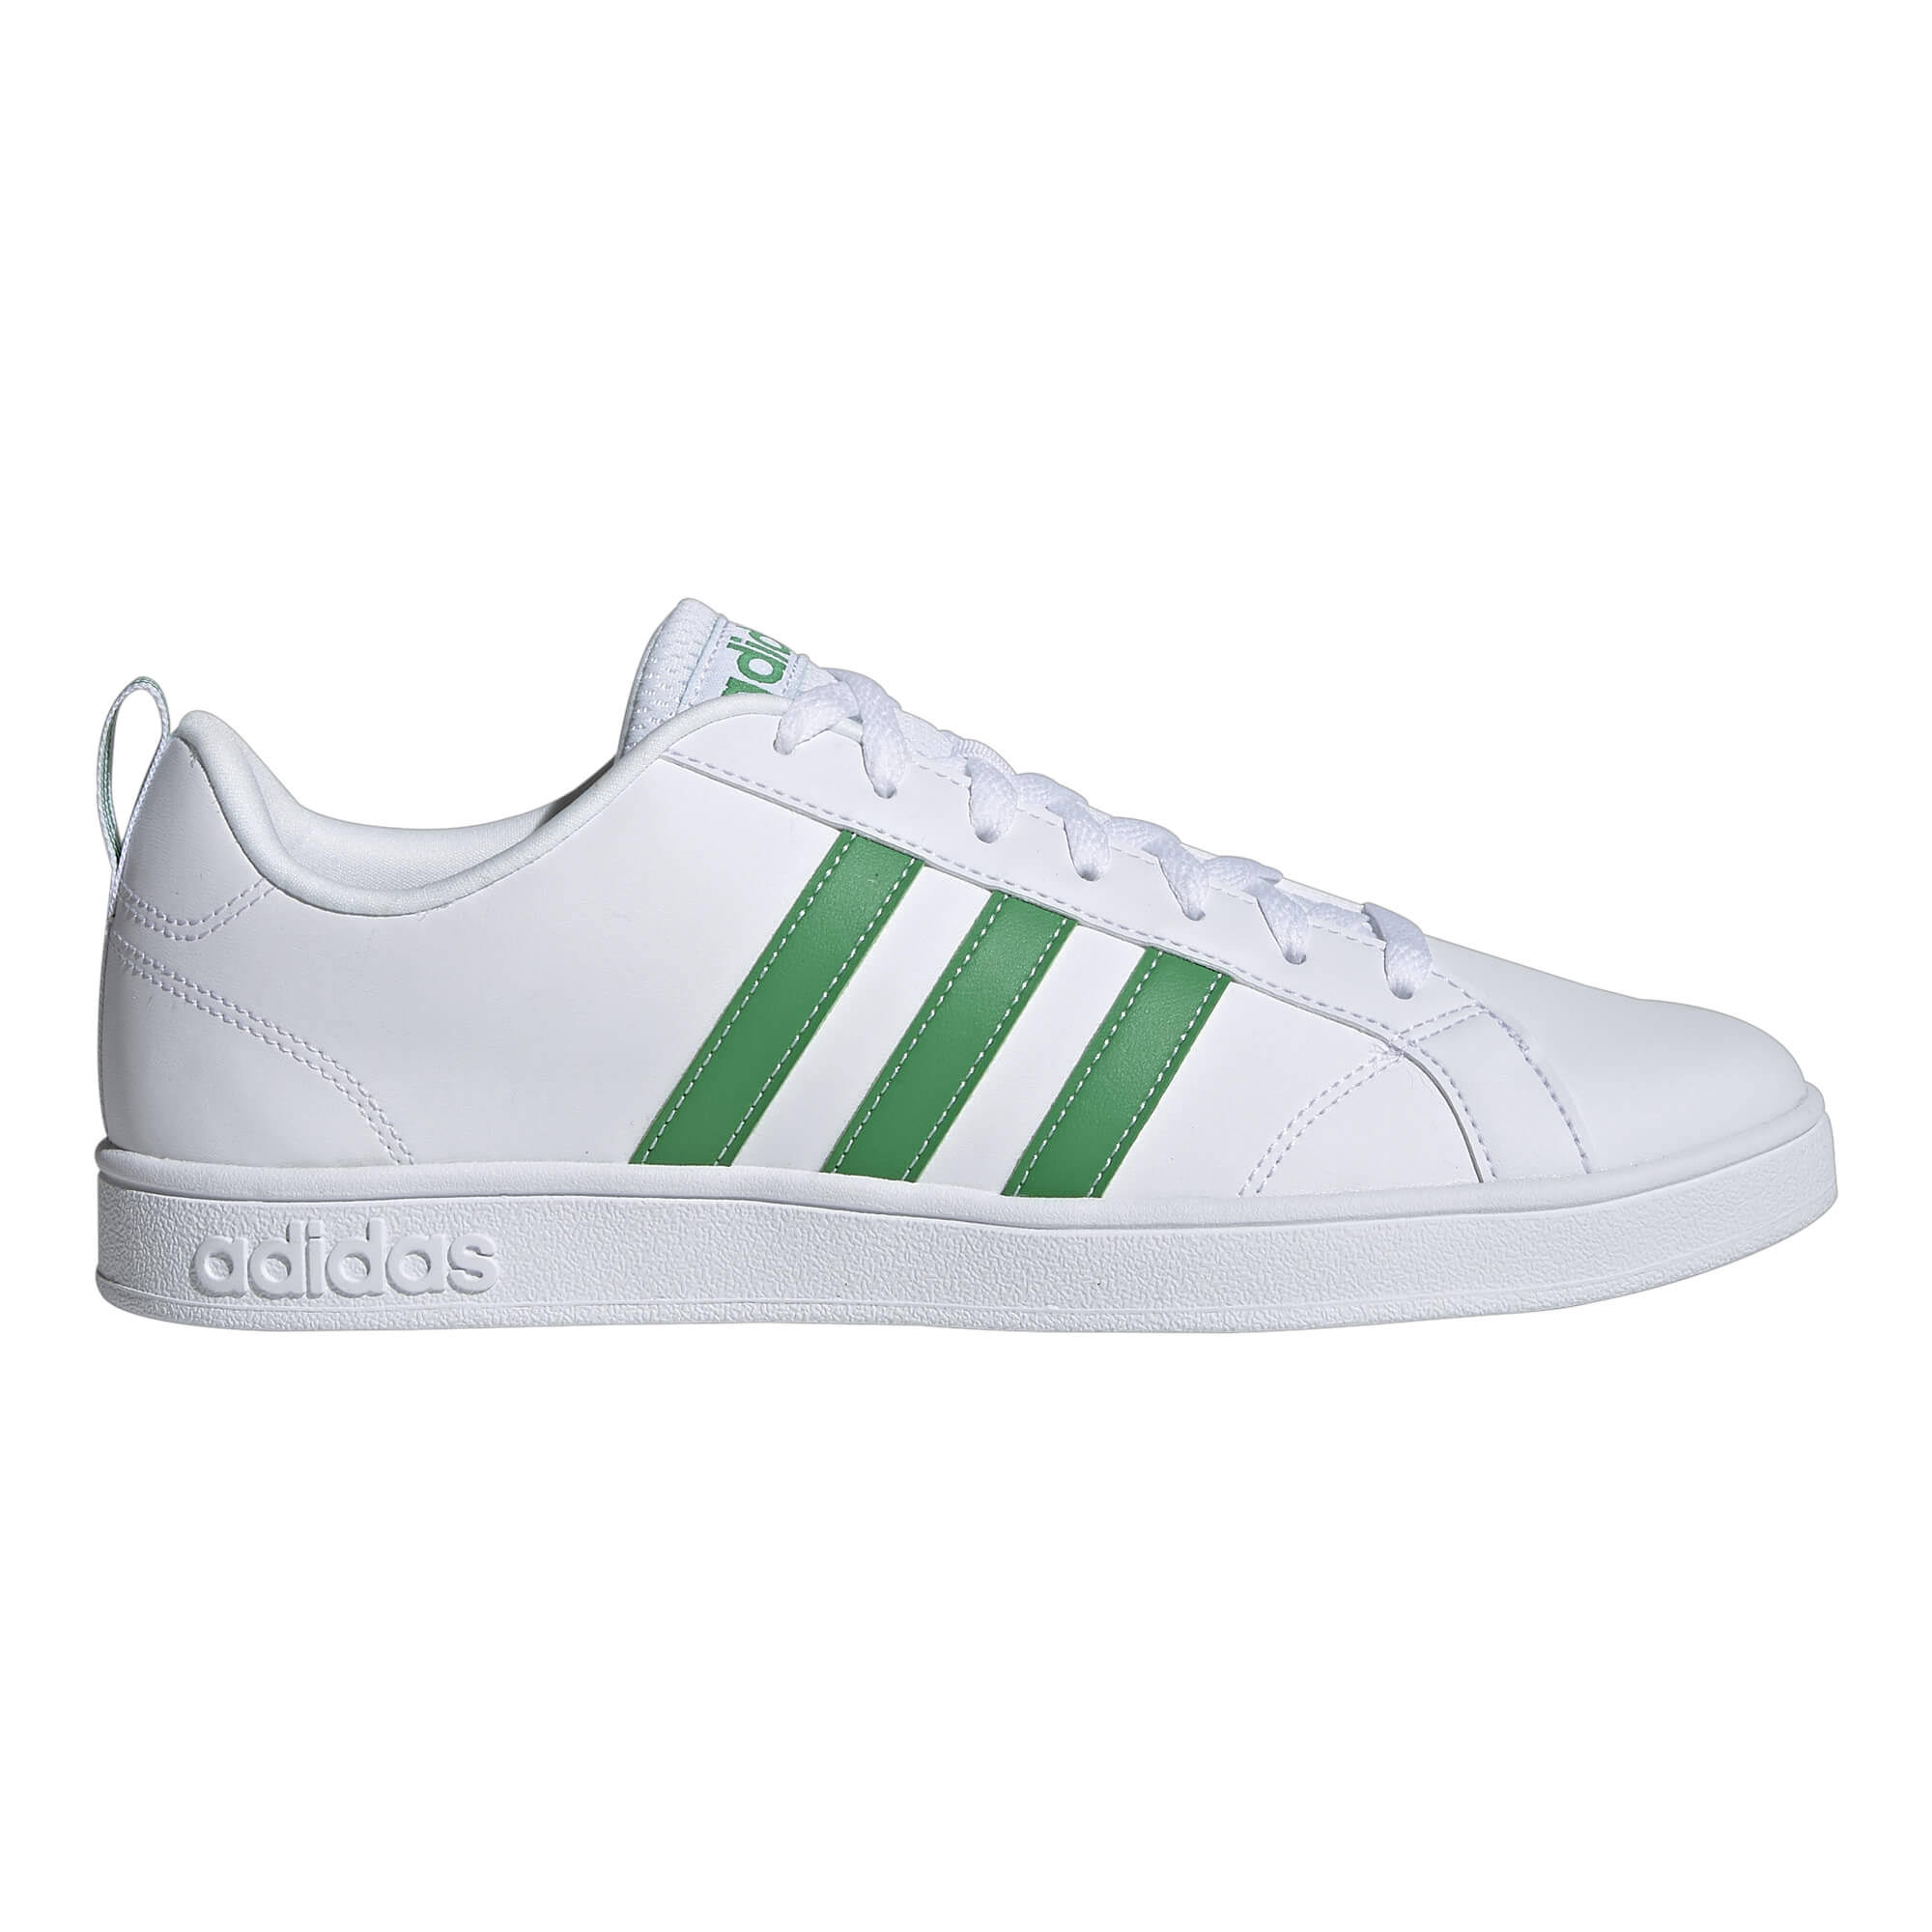 Witgroenzwart Vs Vs Schuh Adidas Advantage Adidas Advantage Vs Advantage Schuh Adidas Schuh Witgroenzwart sQrdxhtC